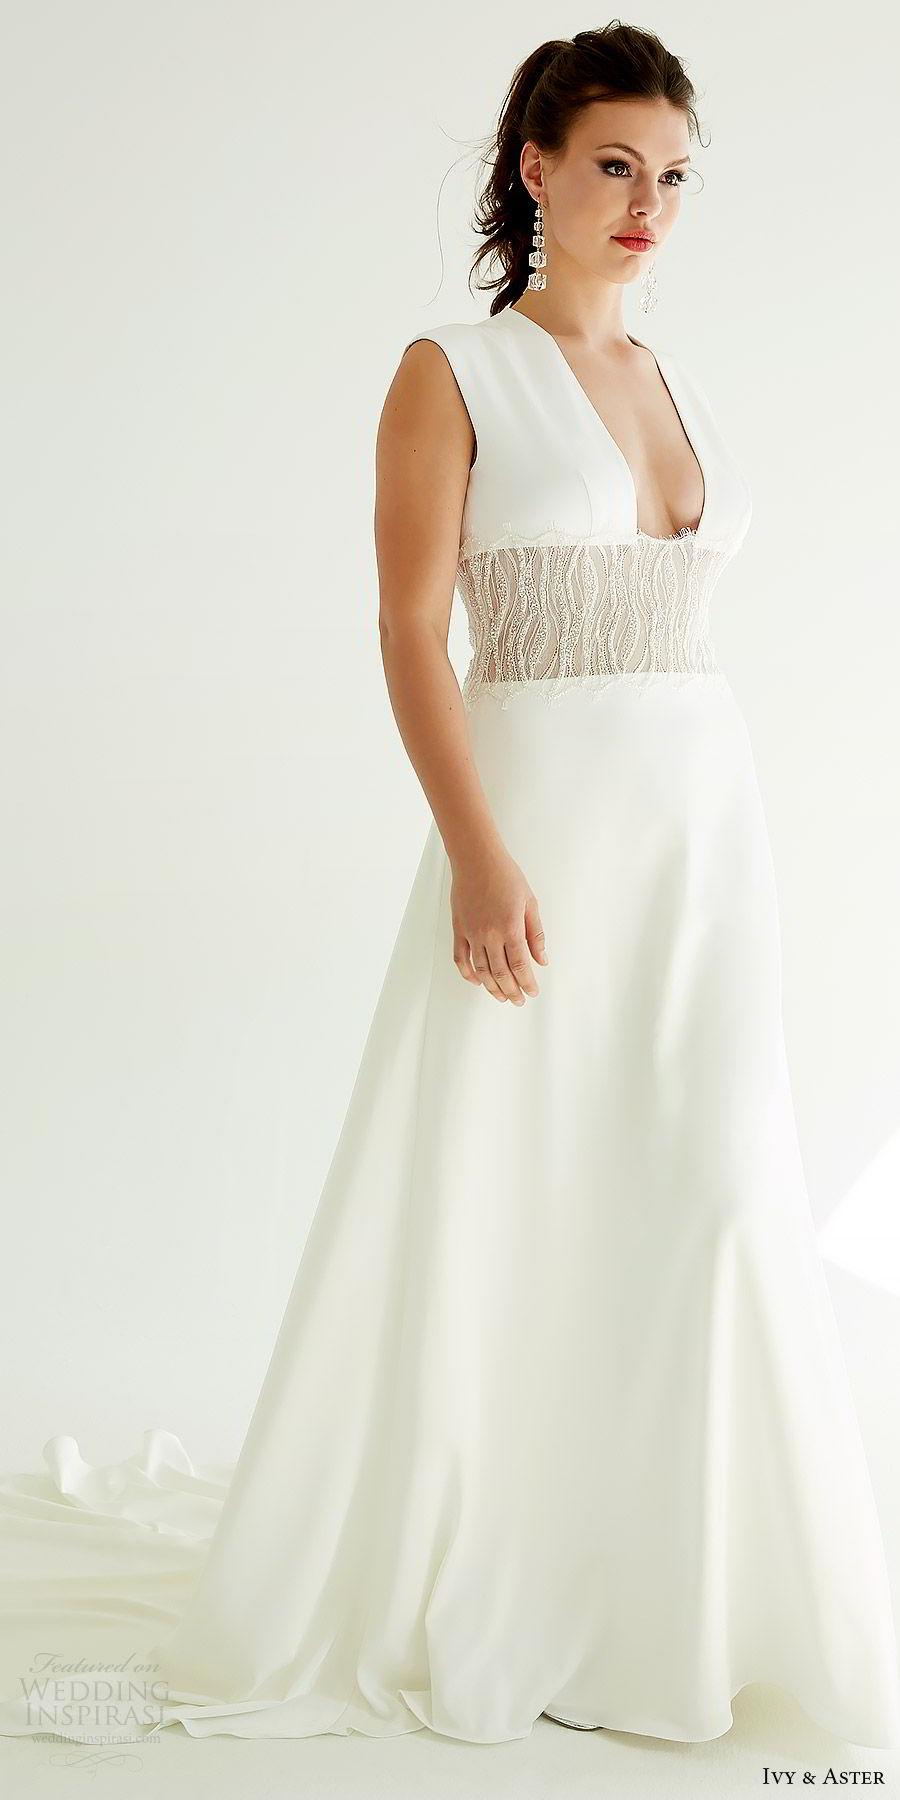 ivy aster bridal 2019 sleeveless deep plunging squeare v neck beaded waist a line skirt wedding dress (mila) mv elegant modern